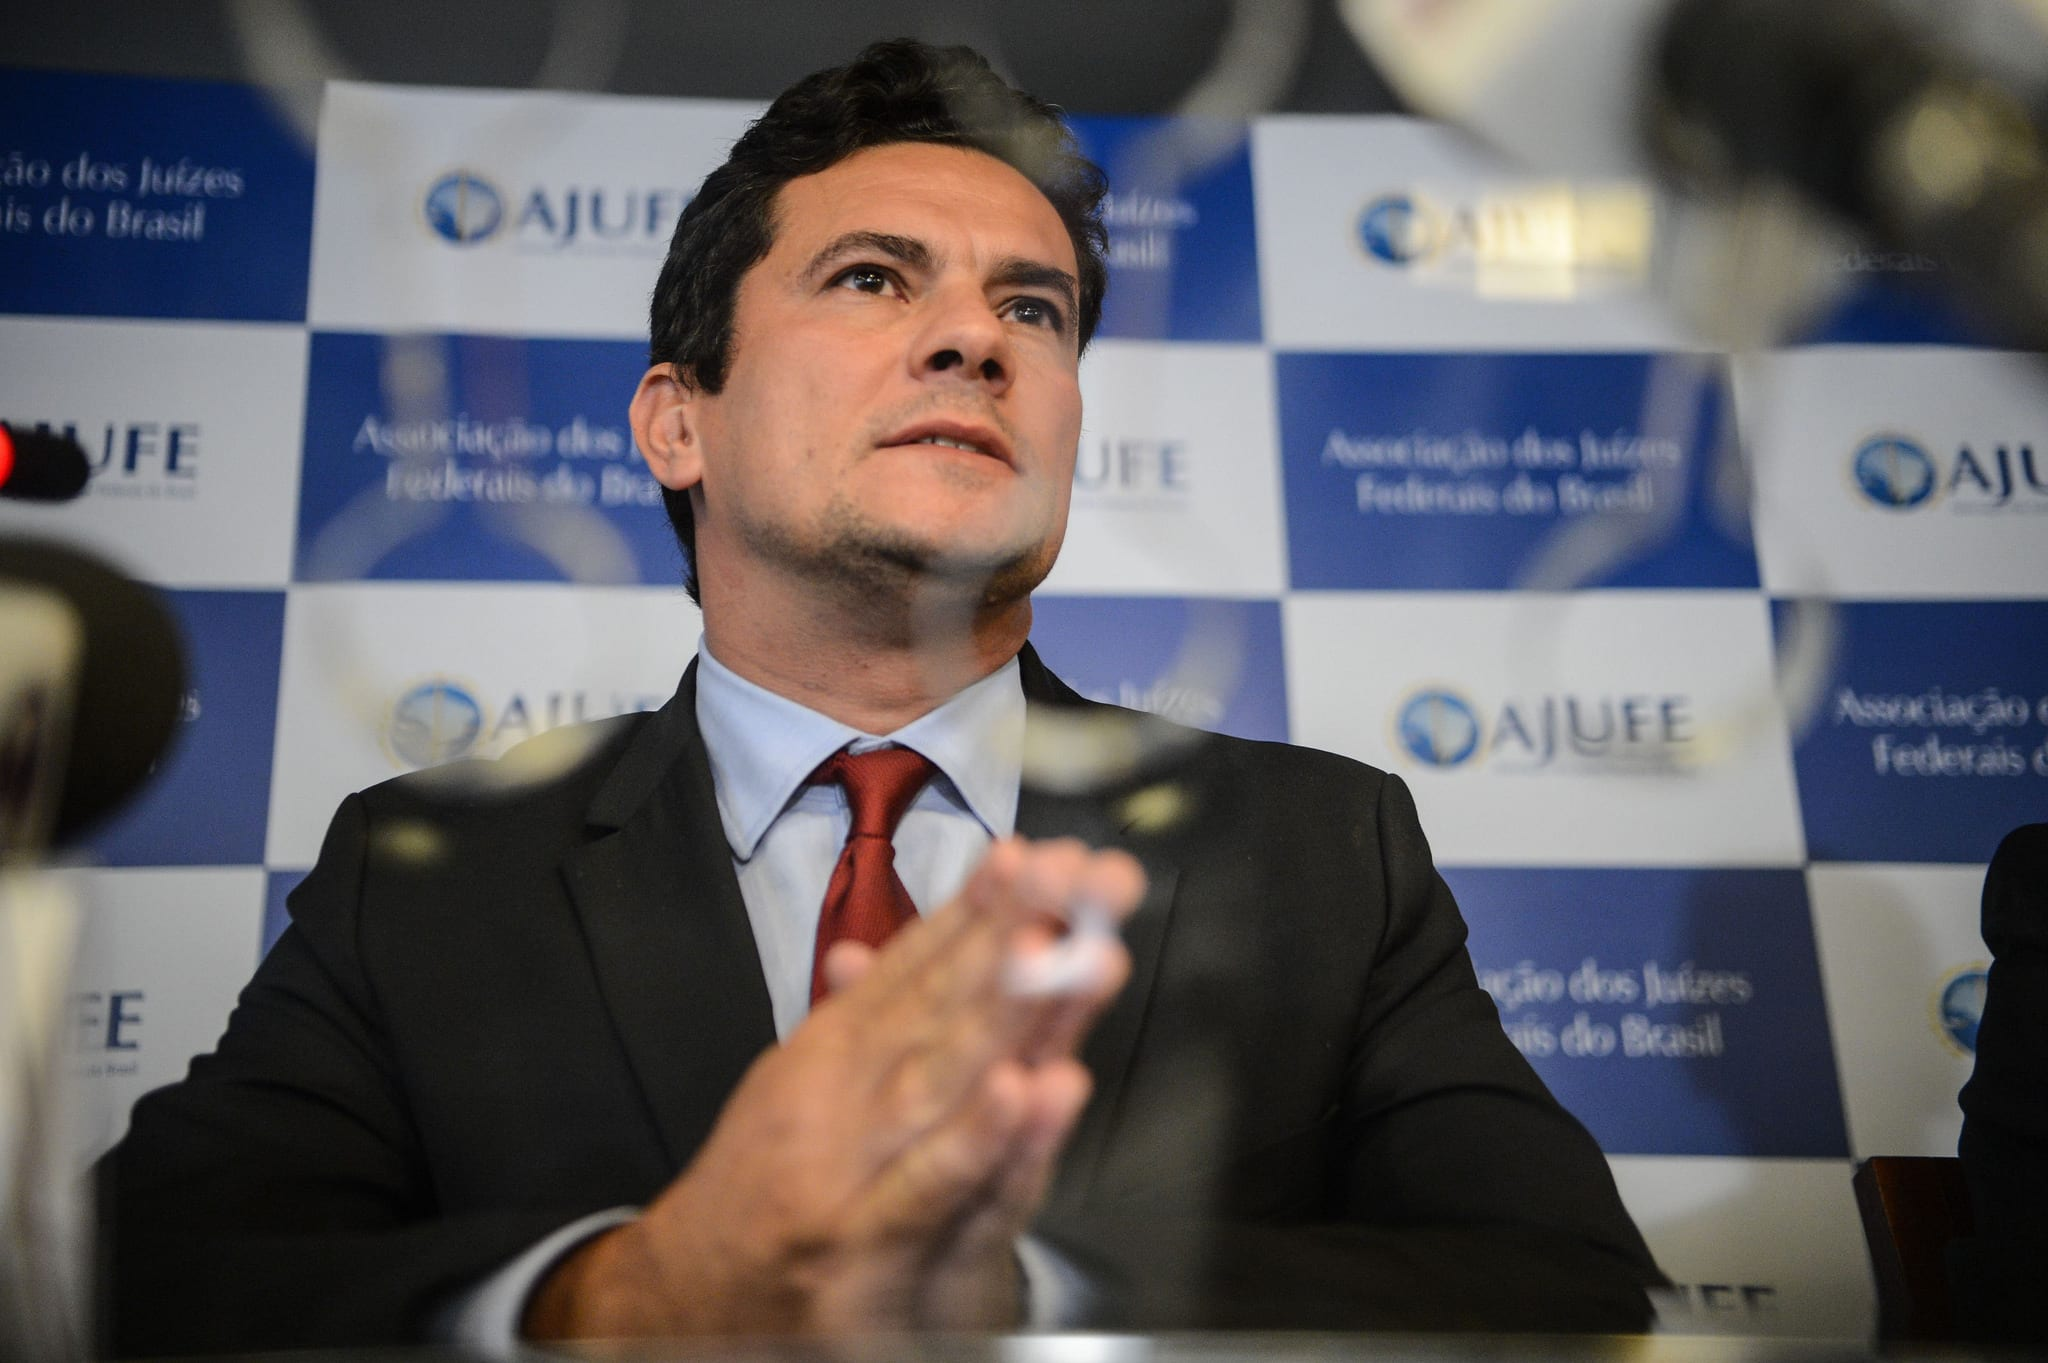 Juiz federal Sérgio Fernando Moro (Fabio Rodrigues Pozzebom/Agência Brasil)